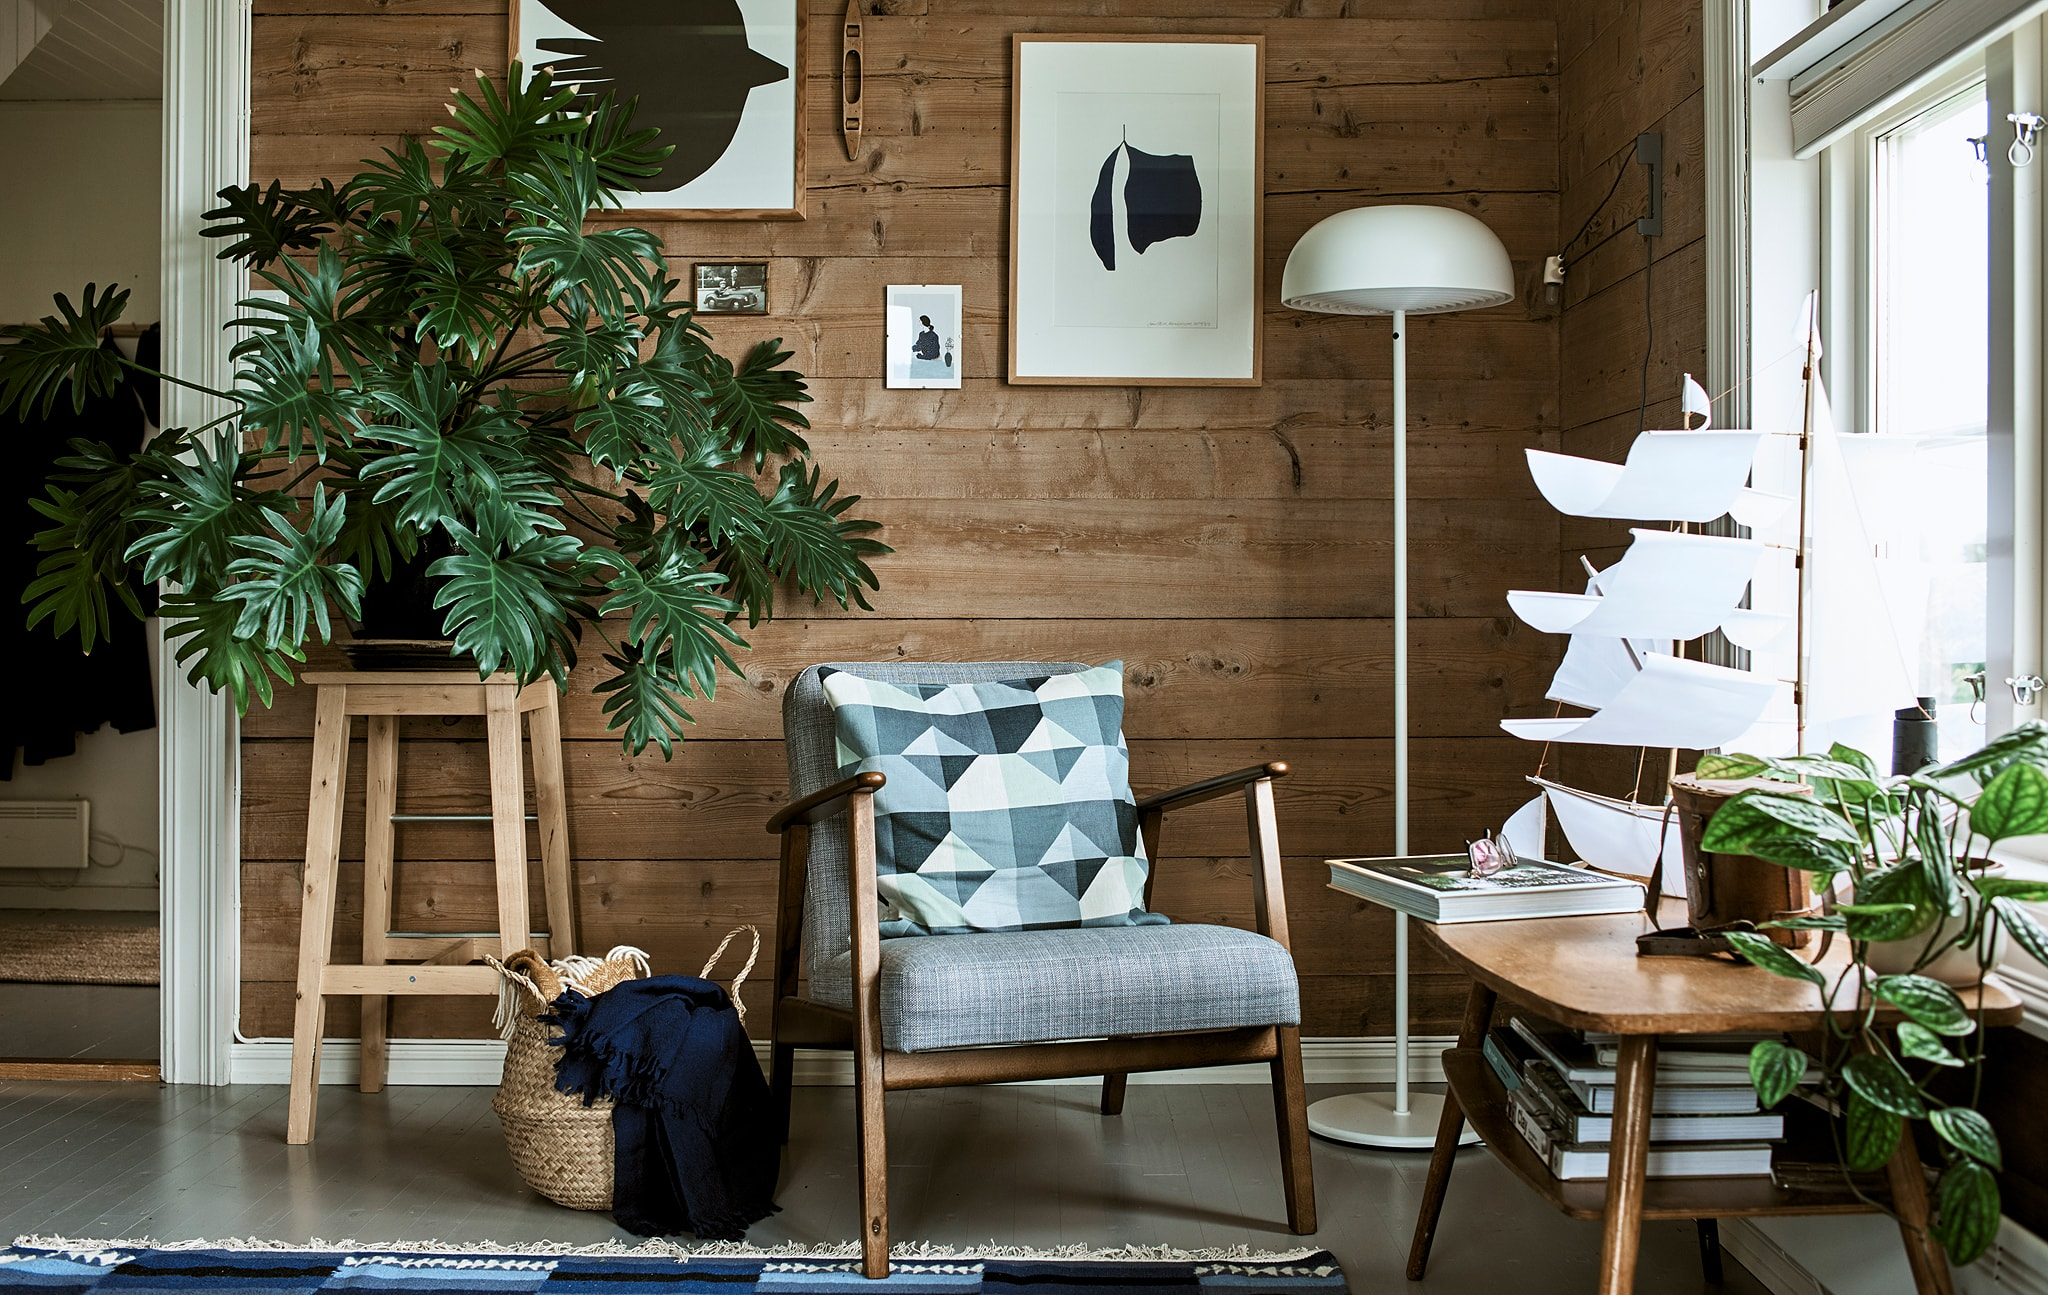 Ruang keluarga bertema rustic dengan kursi kayu berlengan, lampu lantai putih dan bangku yang digunakan sebagai stand tanaman untuk tumbuhan berdaun lebar.